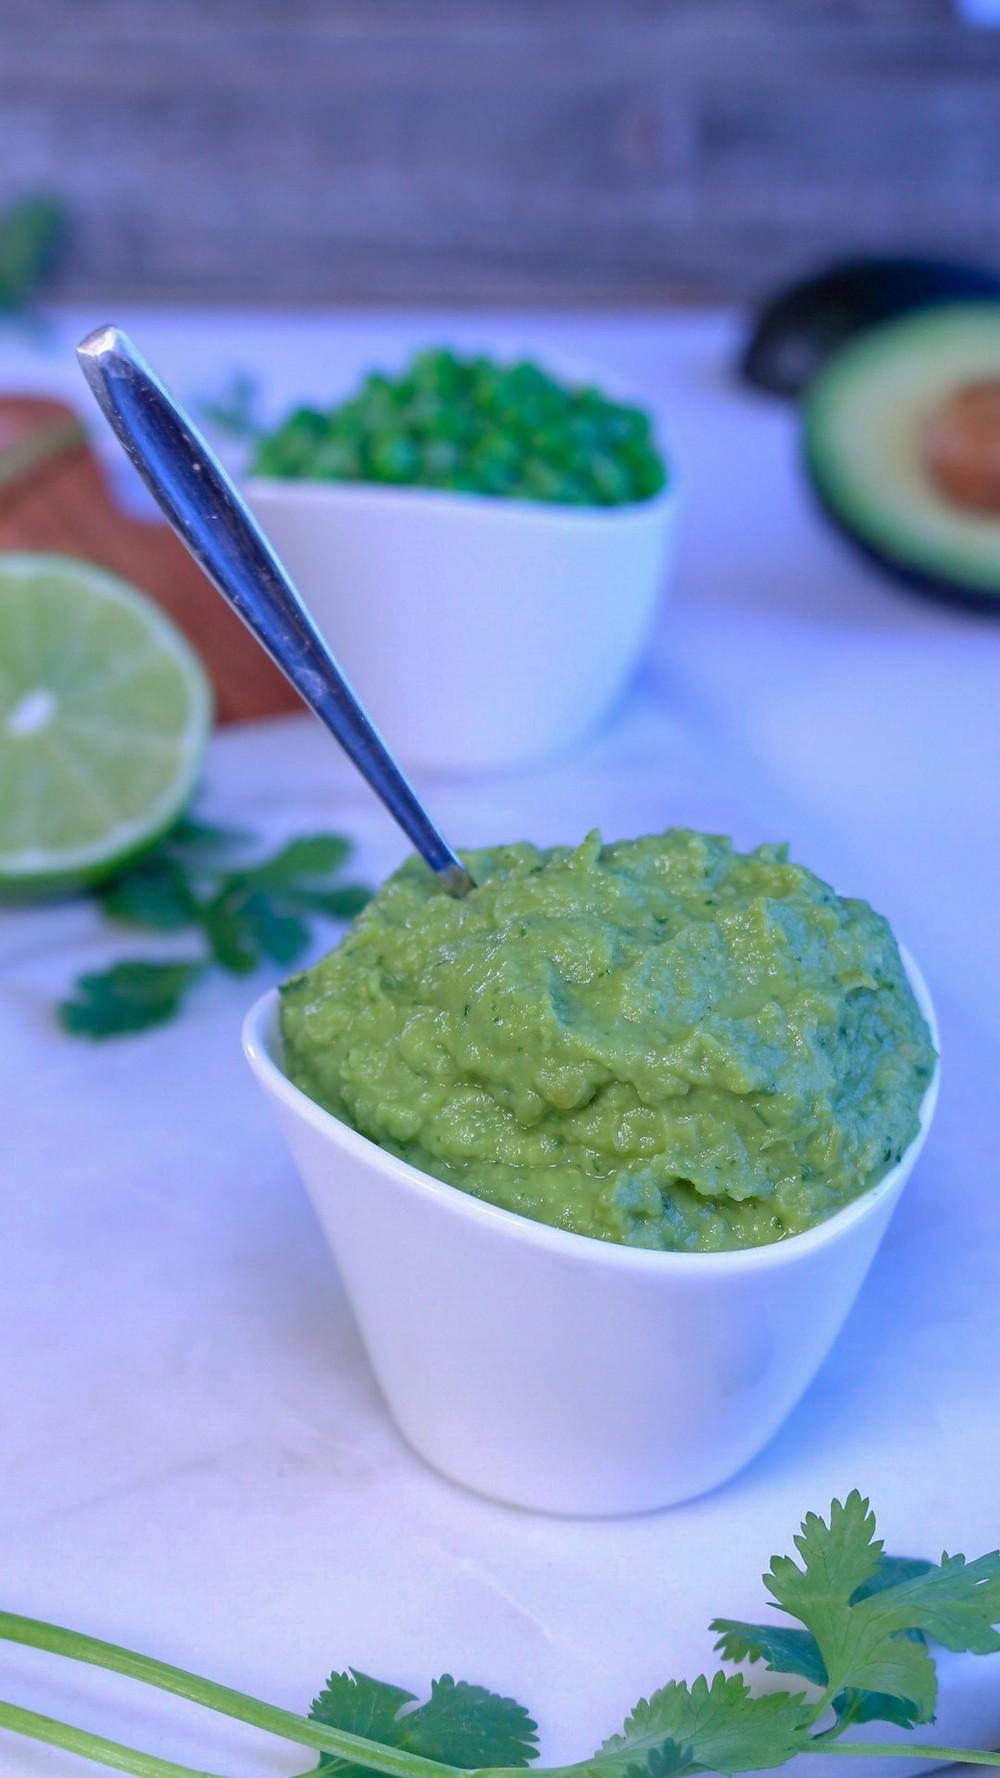 Plant-based Gluten-free Green Pea Avocado Guacamole